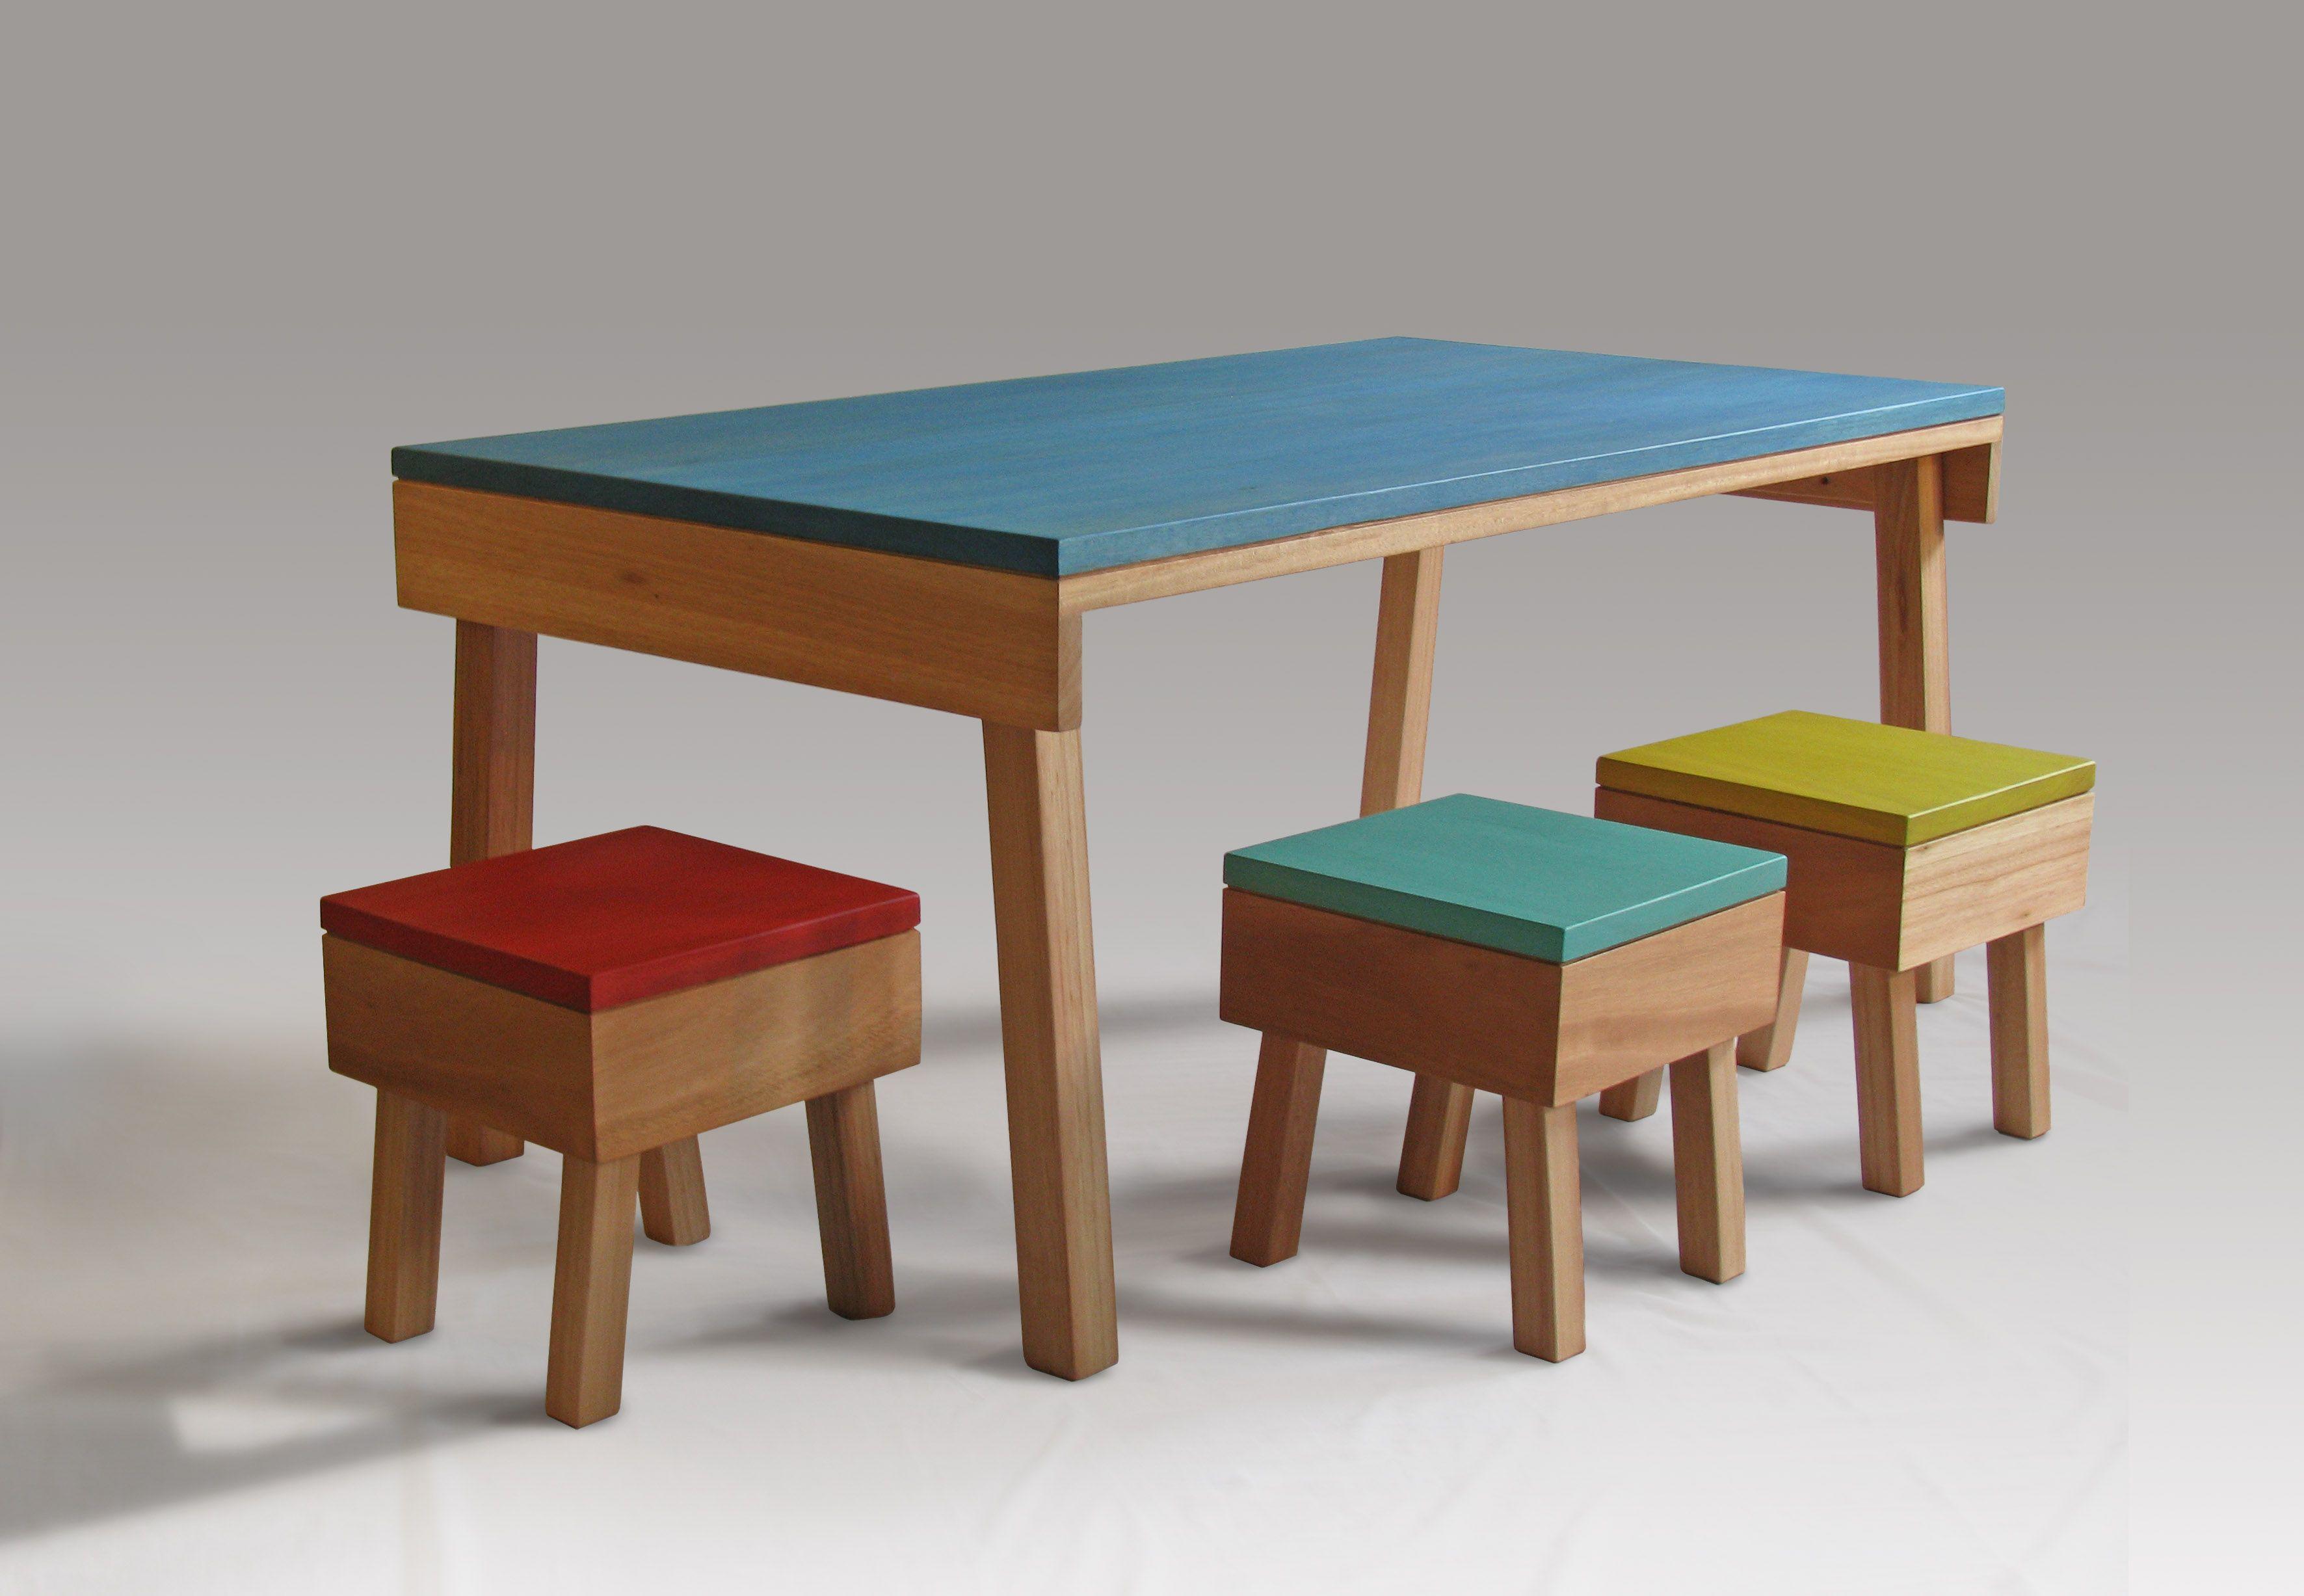 Peq Sistema De Mobiliario Escolar By Muar Dise O Uruguay  # Muebles Artesanales Casa Muar